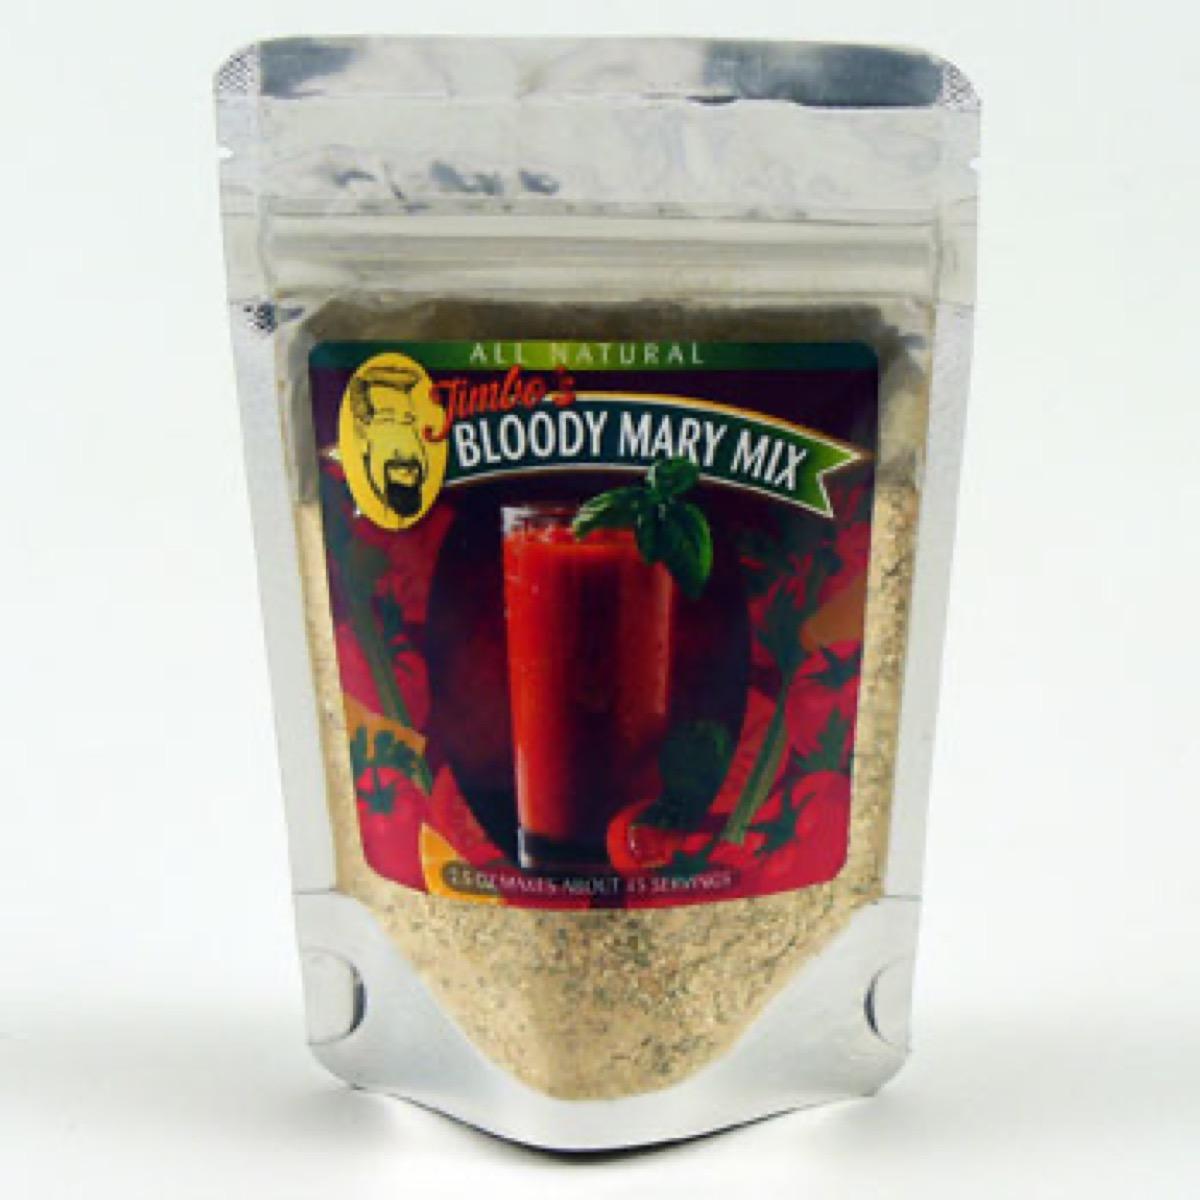 bag of jimbo's bloody mary mix